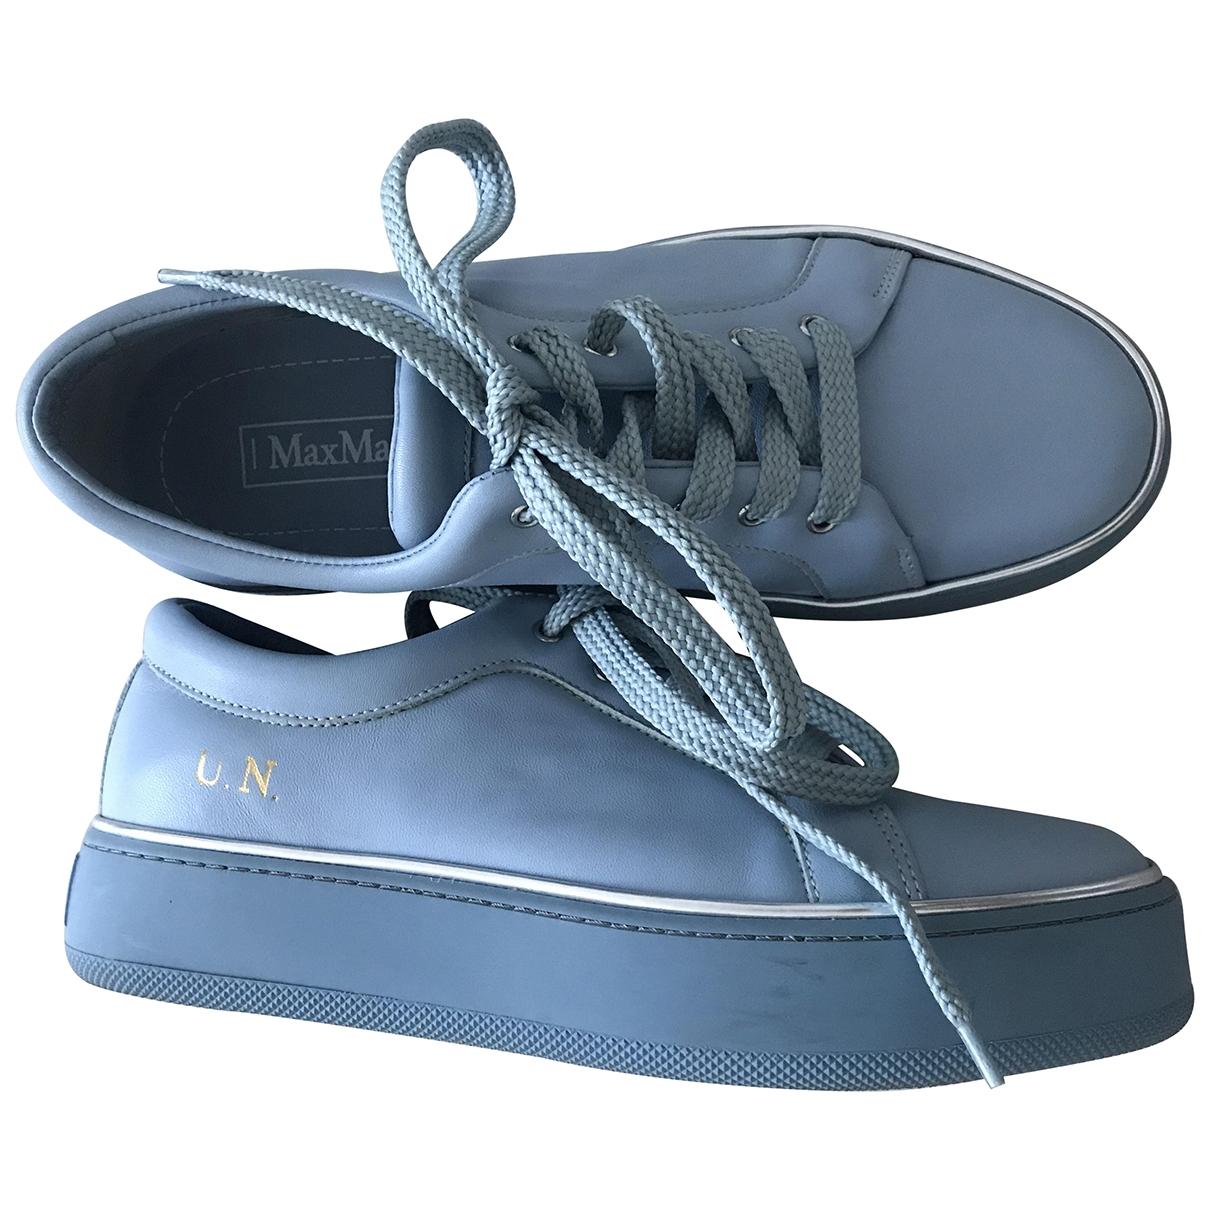 Max Mara N Blue Leather Trainers for Women 37 EU